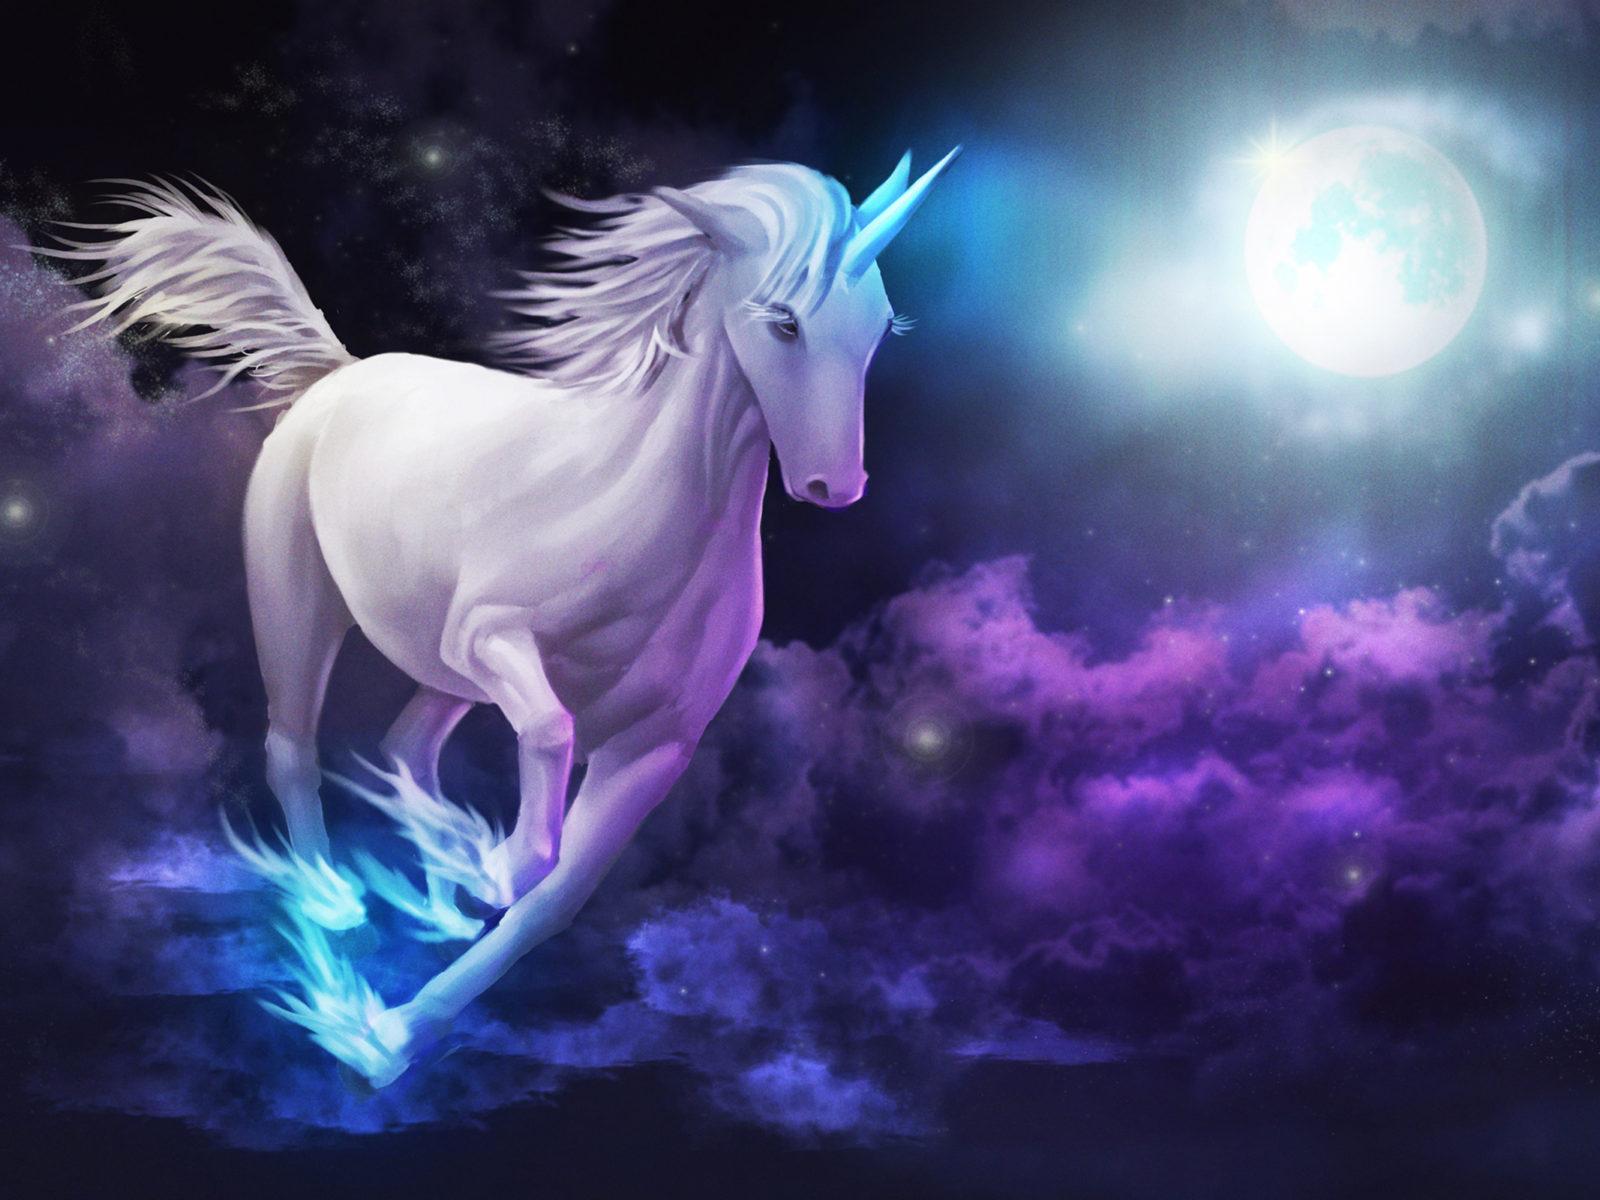 Cute Bunny Wallpaper Hd Unicorn Galloping Sky Clouds Full Moon Desktop Wallpaper